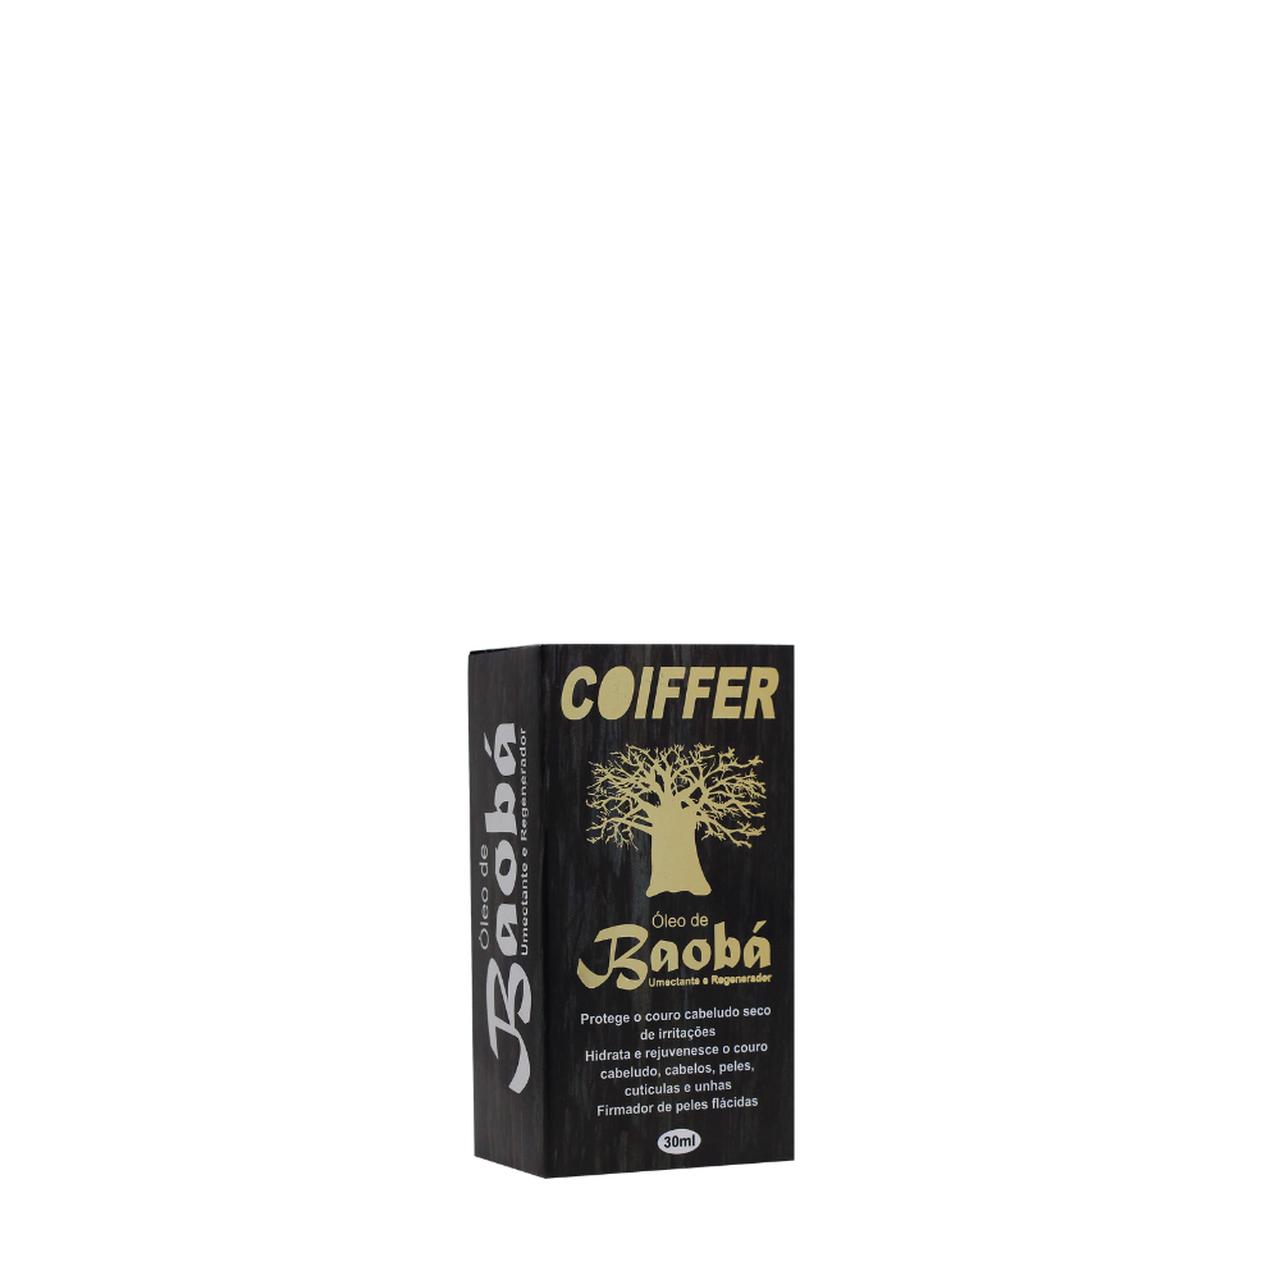 Oleo de Baoba Coiffer